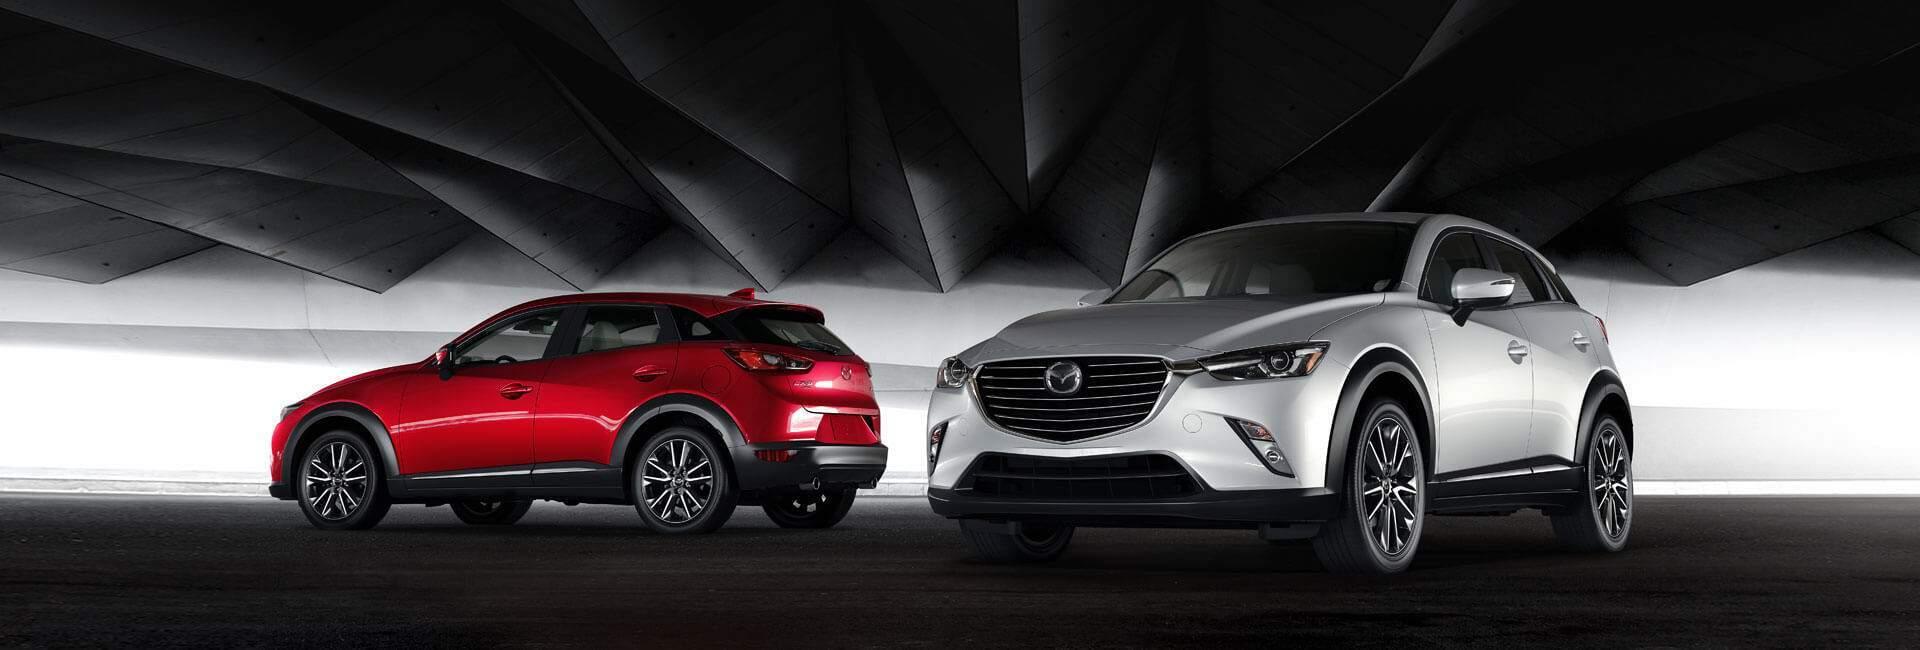 Mazda Dealer Wilson Nc Medlin Mazda